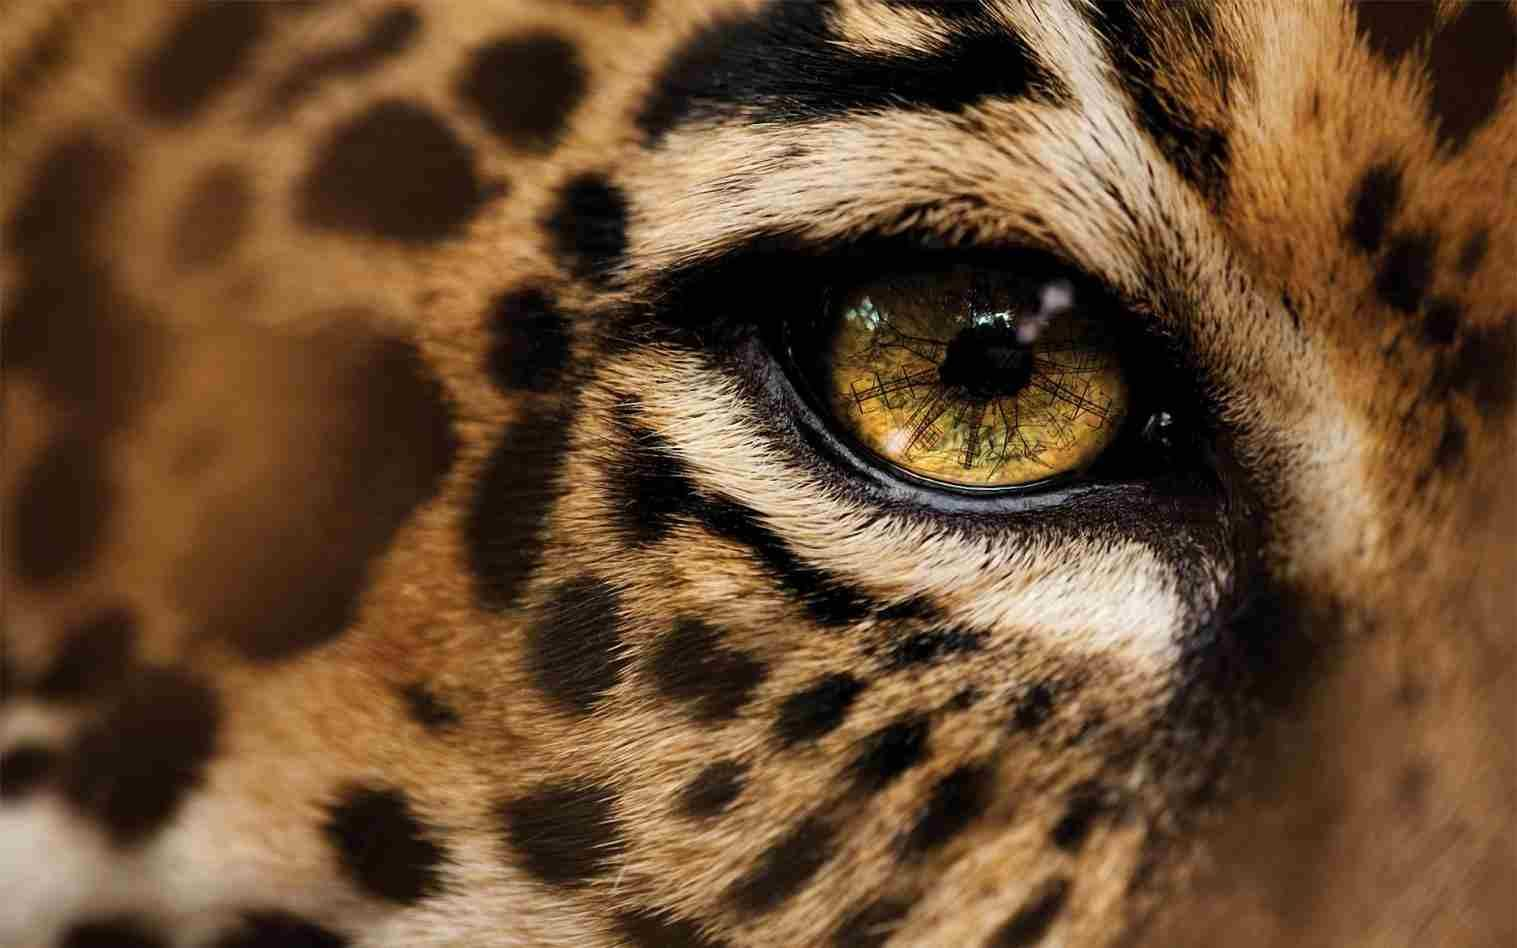 jaguar wallpaper 8150. jaguar animal hd wallpapers | jaguar animal pictures | cool wallpapers. jaguar animal 474121 . uq3c1od – imgur. spot the differences ...